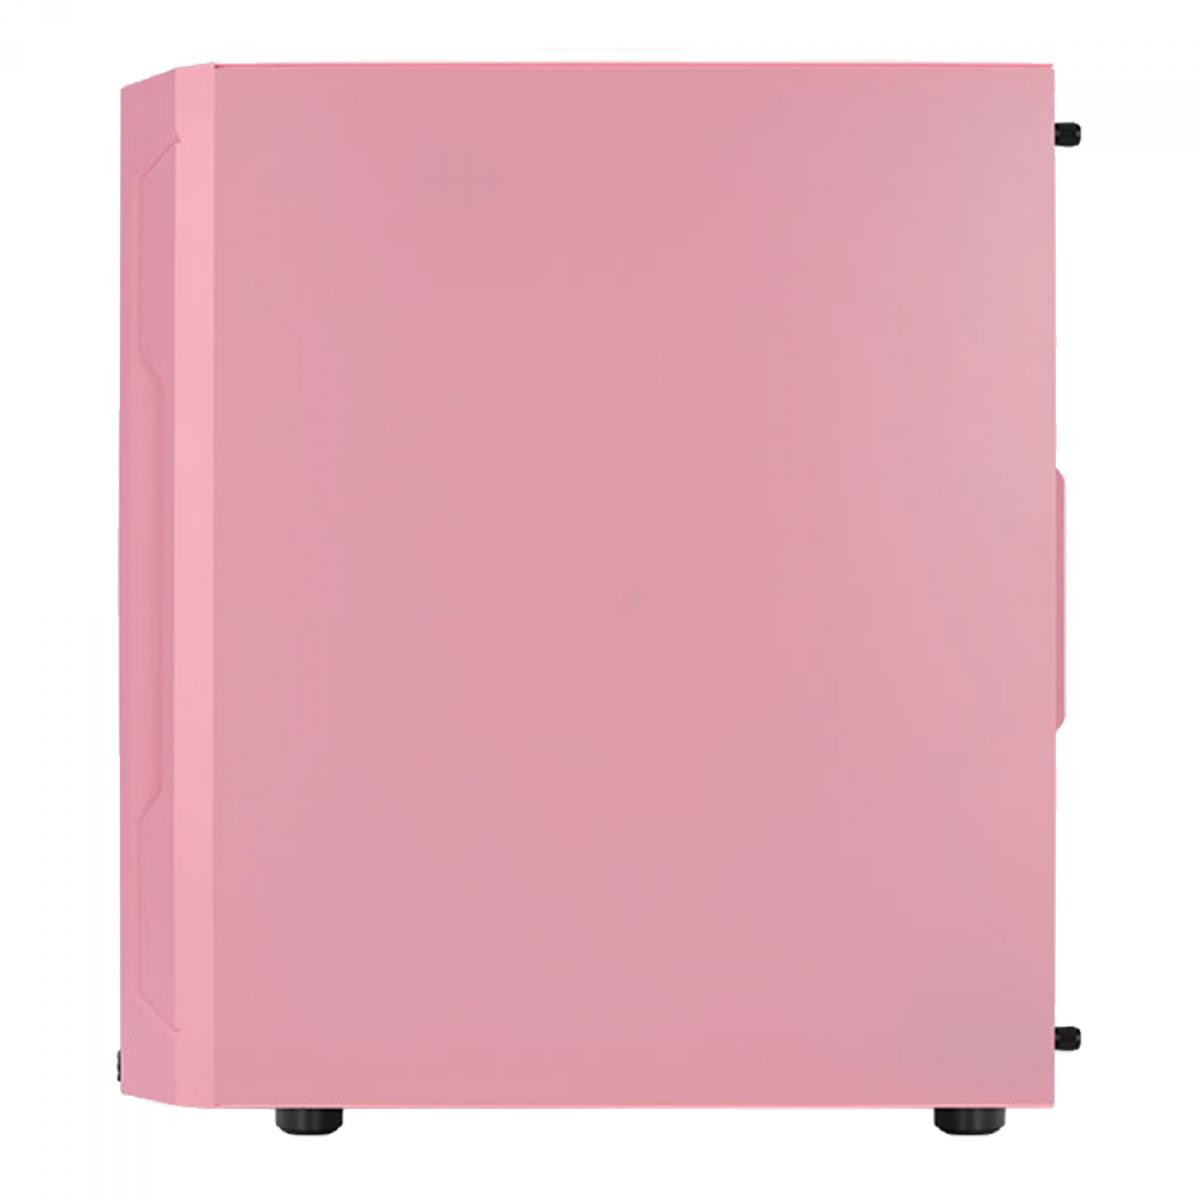 Gabinete Gamer Aerocool Trinity Mini, V1, Pink, Mini Tower, Vidro Temperado, Pink, Micro ATX, Sem Fonte, Com 1 fan, TRINITY MINI-G-PK-V1